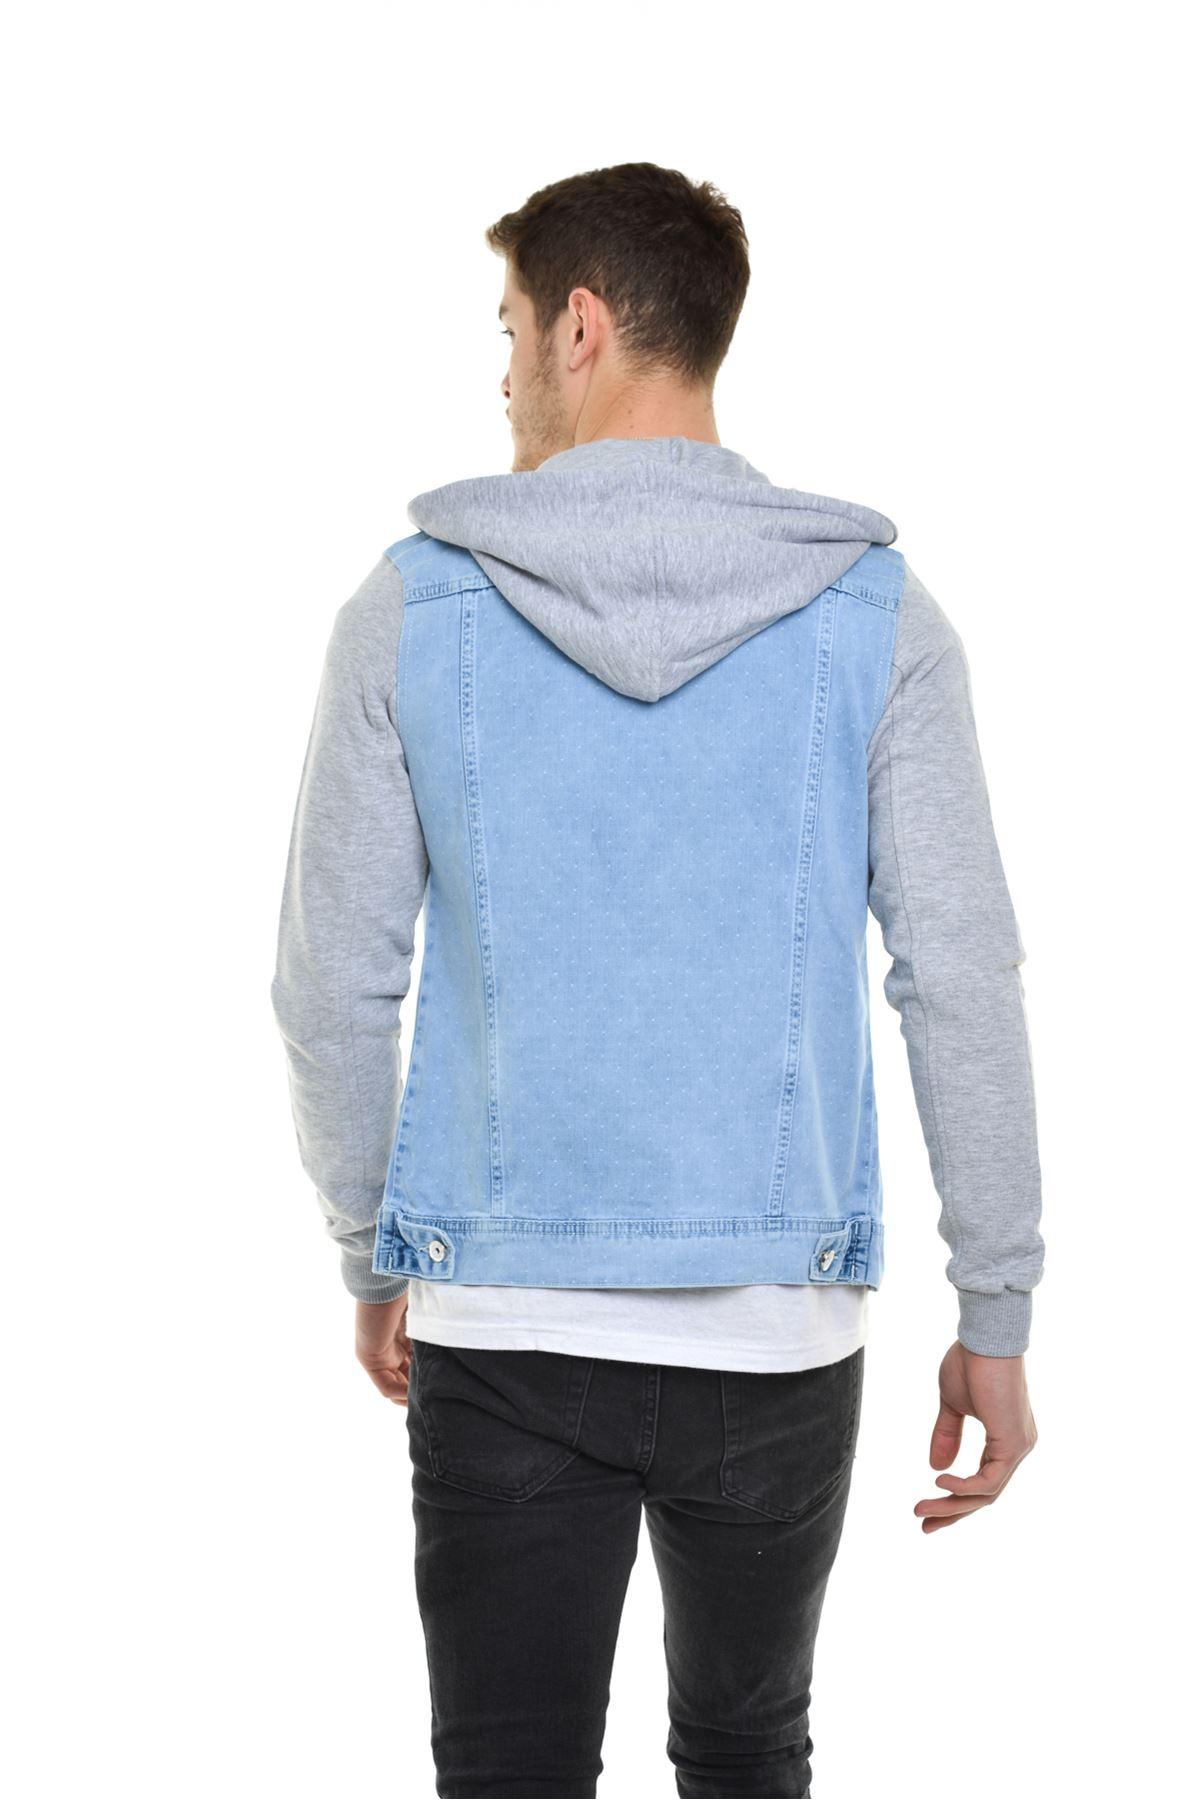 Buz Mavisi Kapüşonlu Desenli Kumaş Detay Erkek Kot Ceket